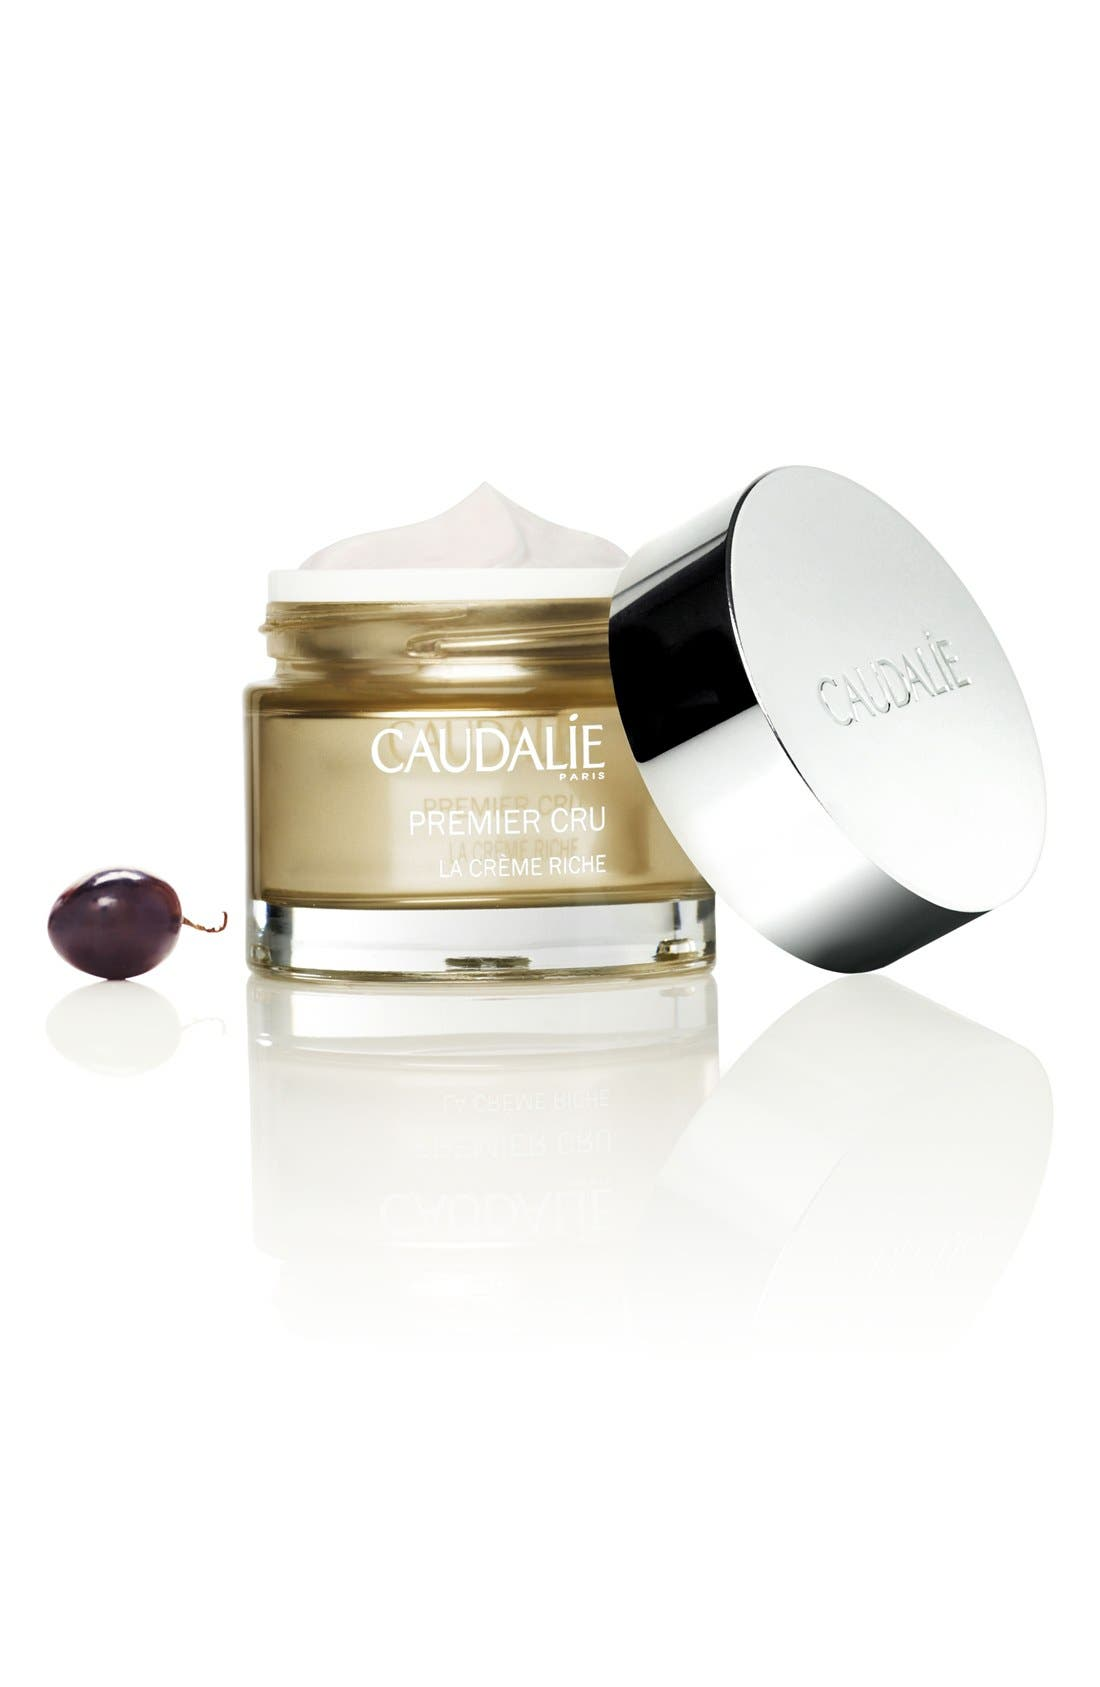 Premier Cru La Crème Rich Ultimate Anti-Aging Rich Cream,                             Alternate thumbnail 3, color,                             000